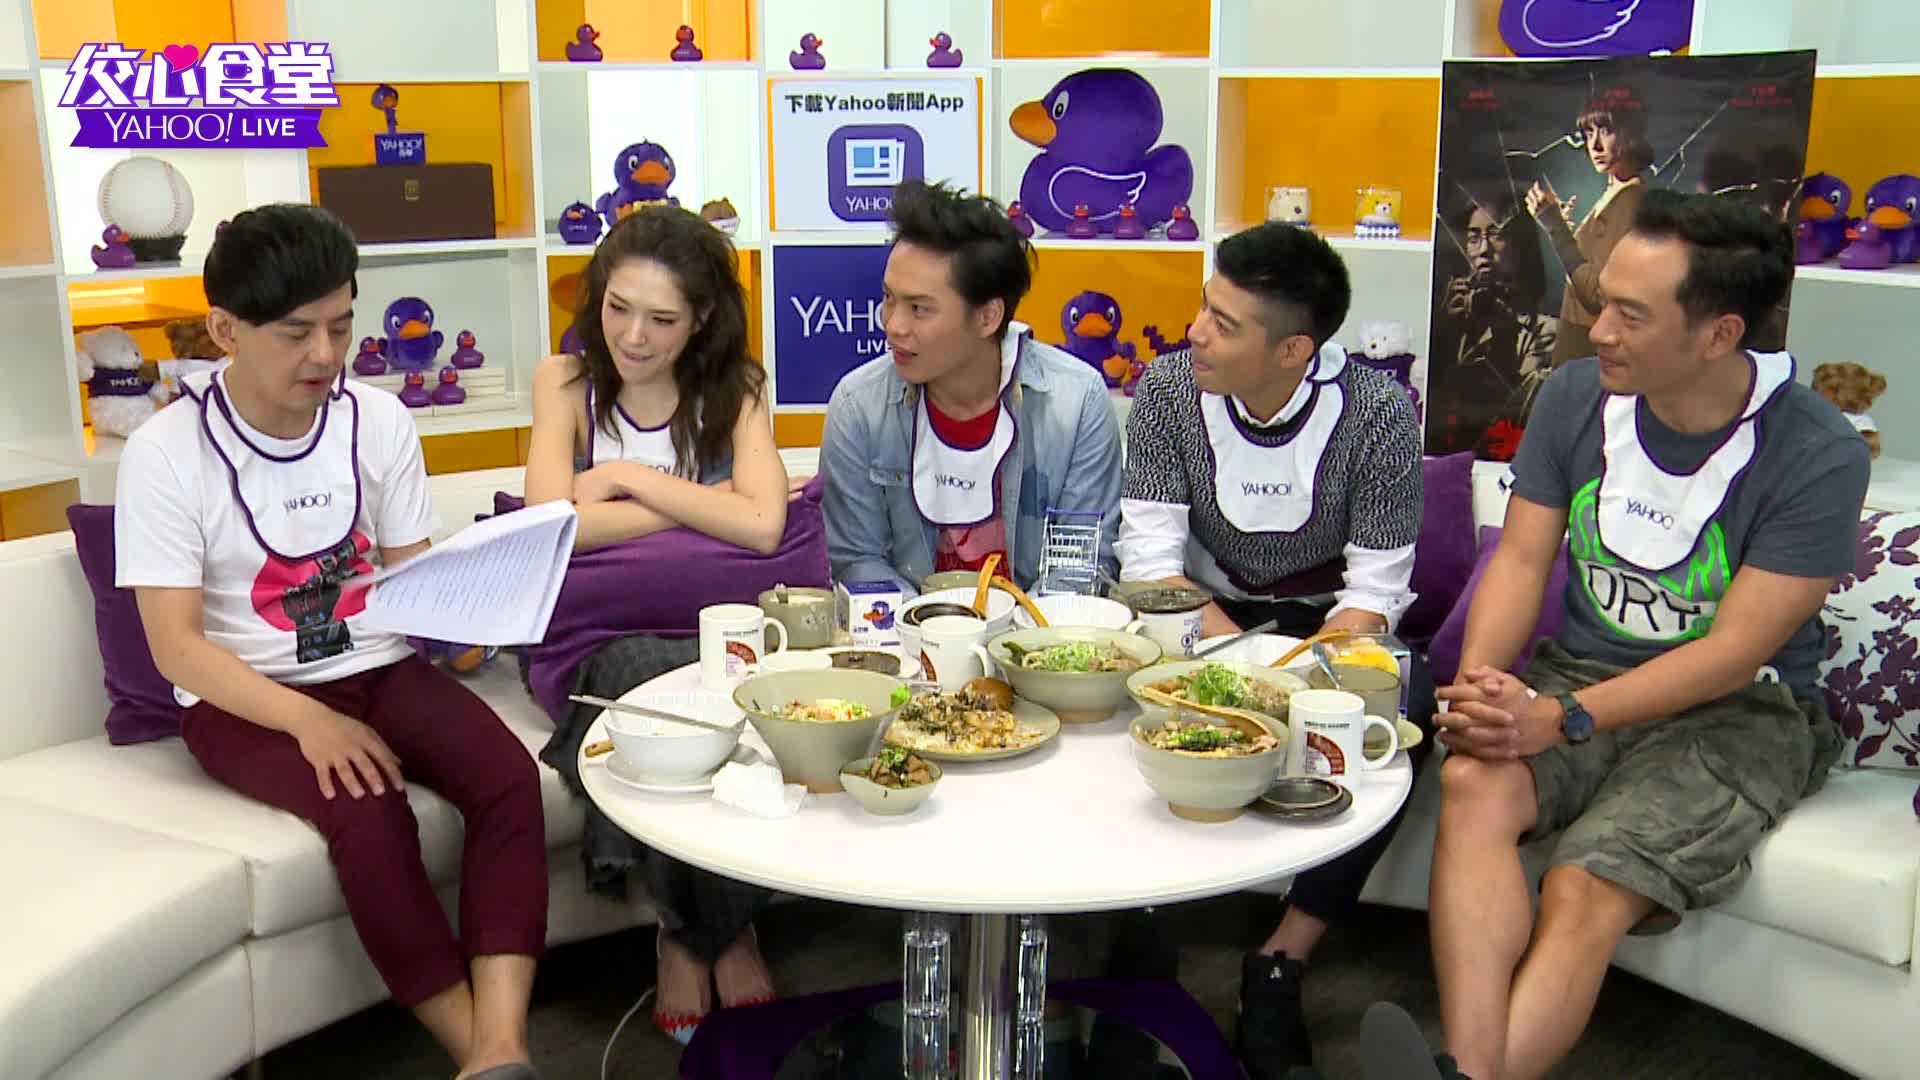 【Yahoo LIVE 佼心食堂】黃鐙輝模仿伍佰介紹電影